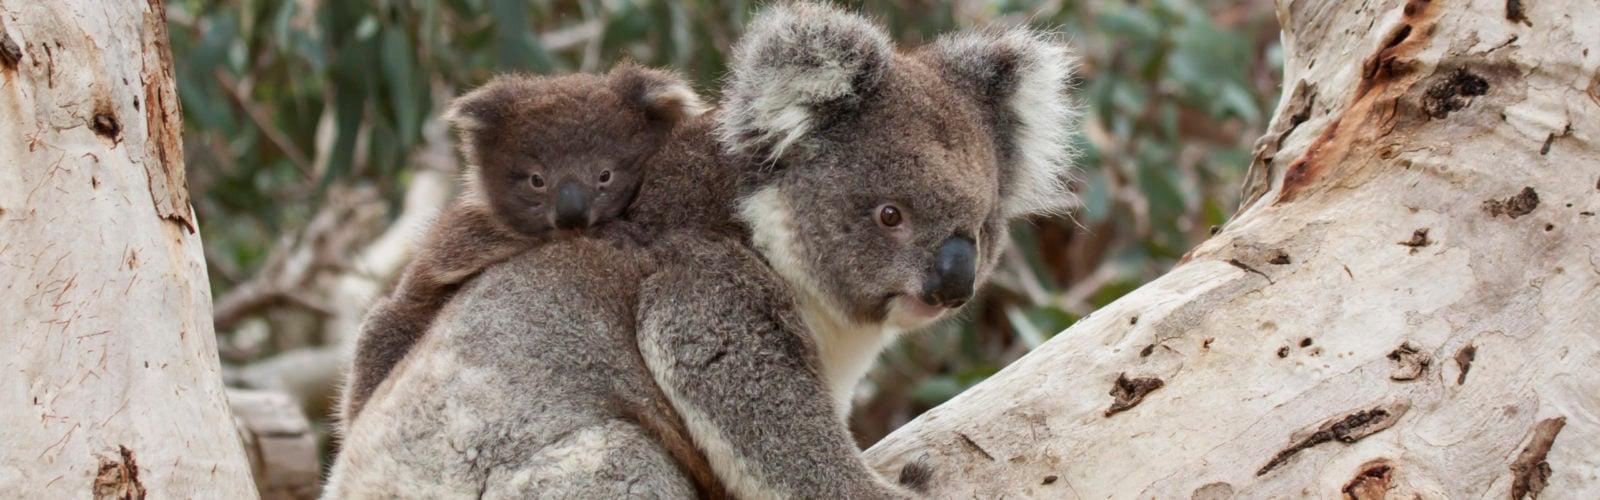 Baby Koala on Mother's Back